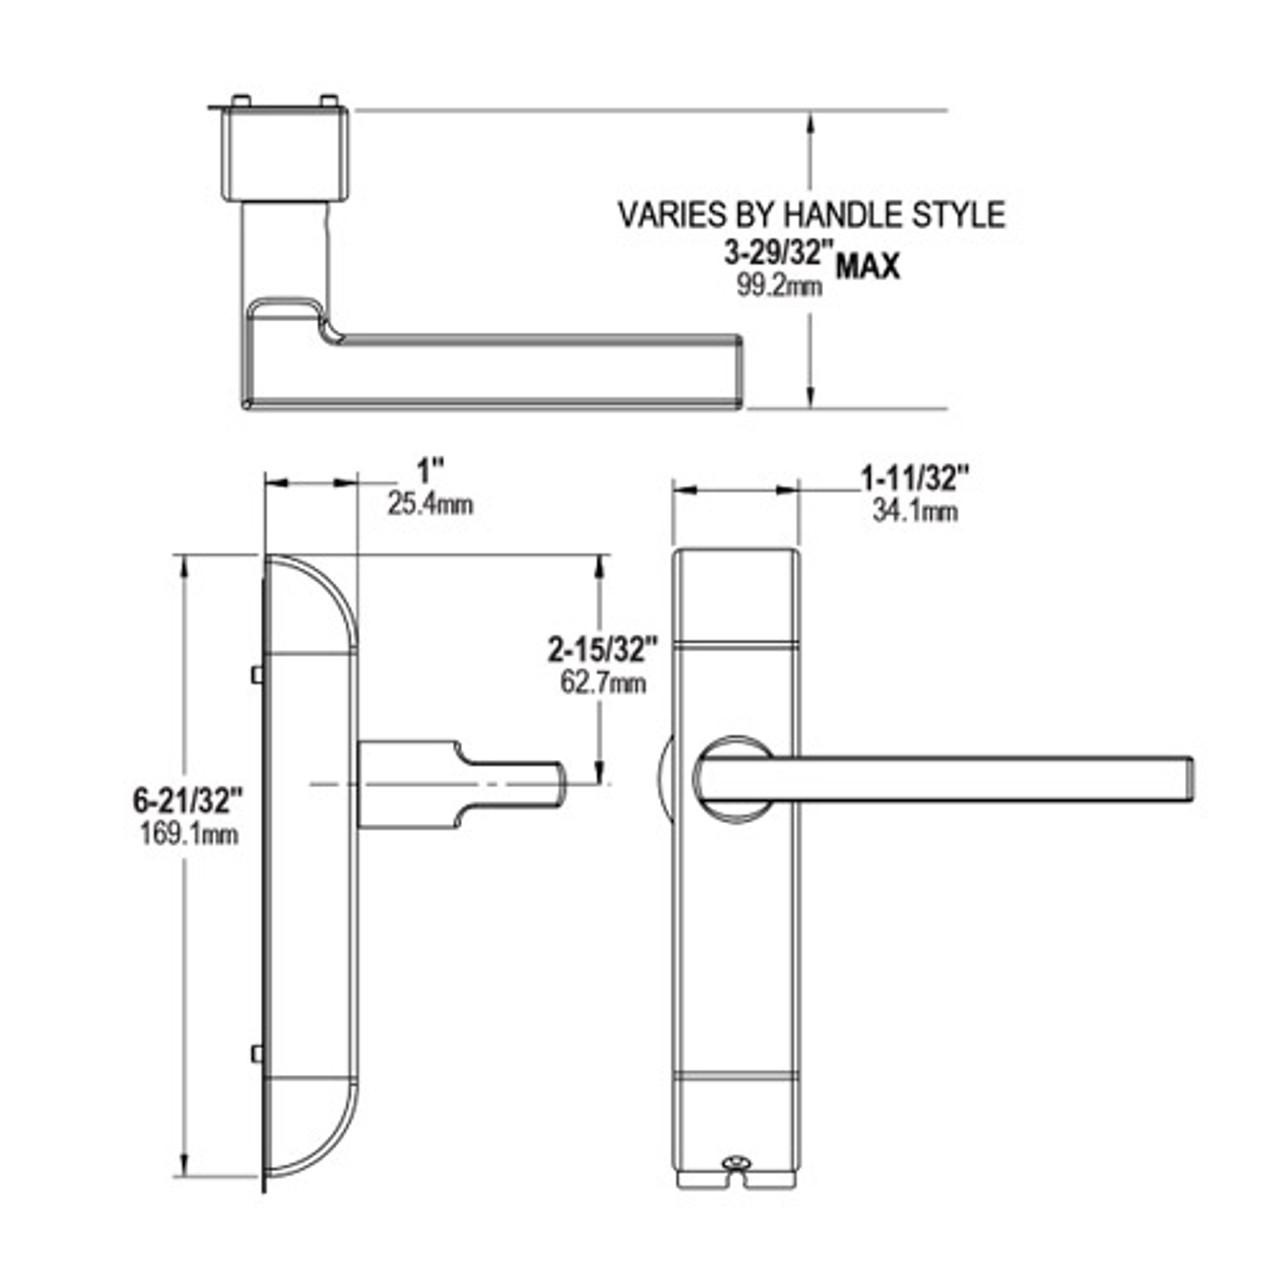 4600-MV-512-US32 Adams Rite MV Designer handle Dimensional View